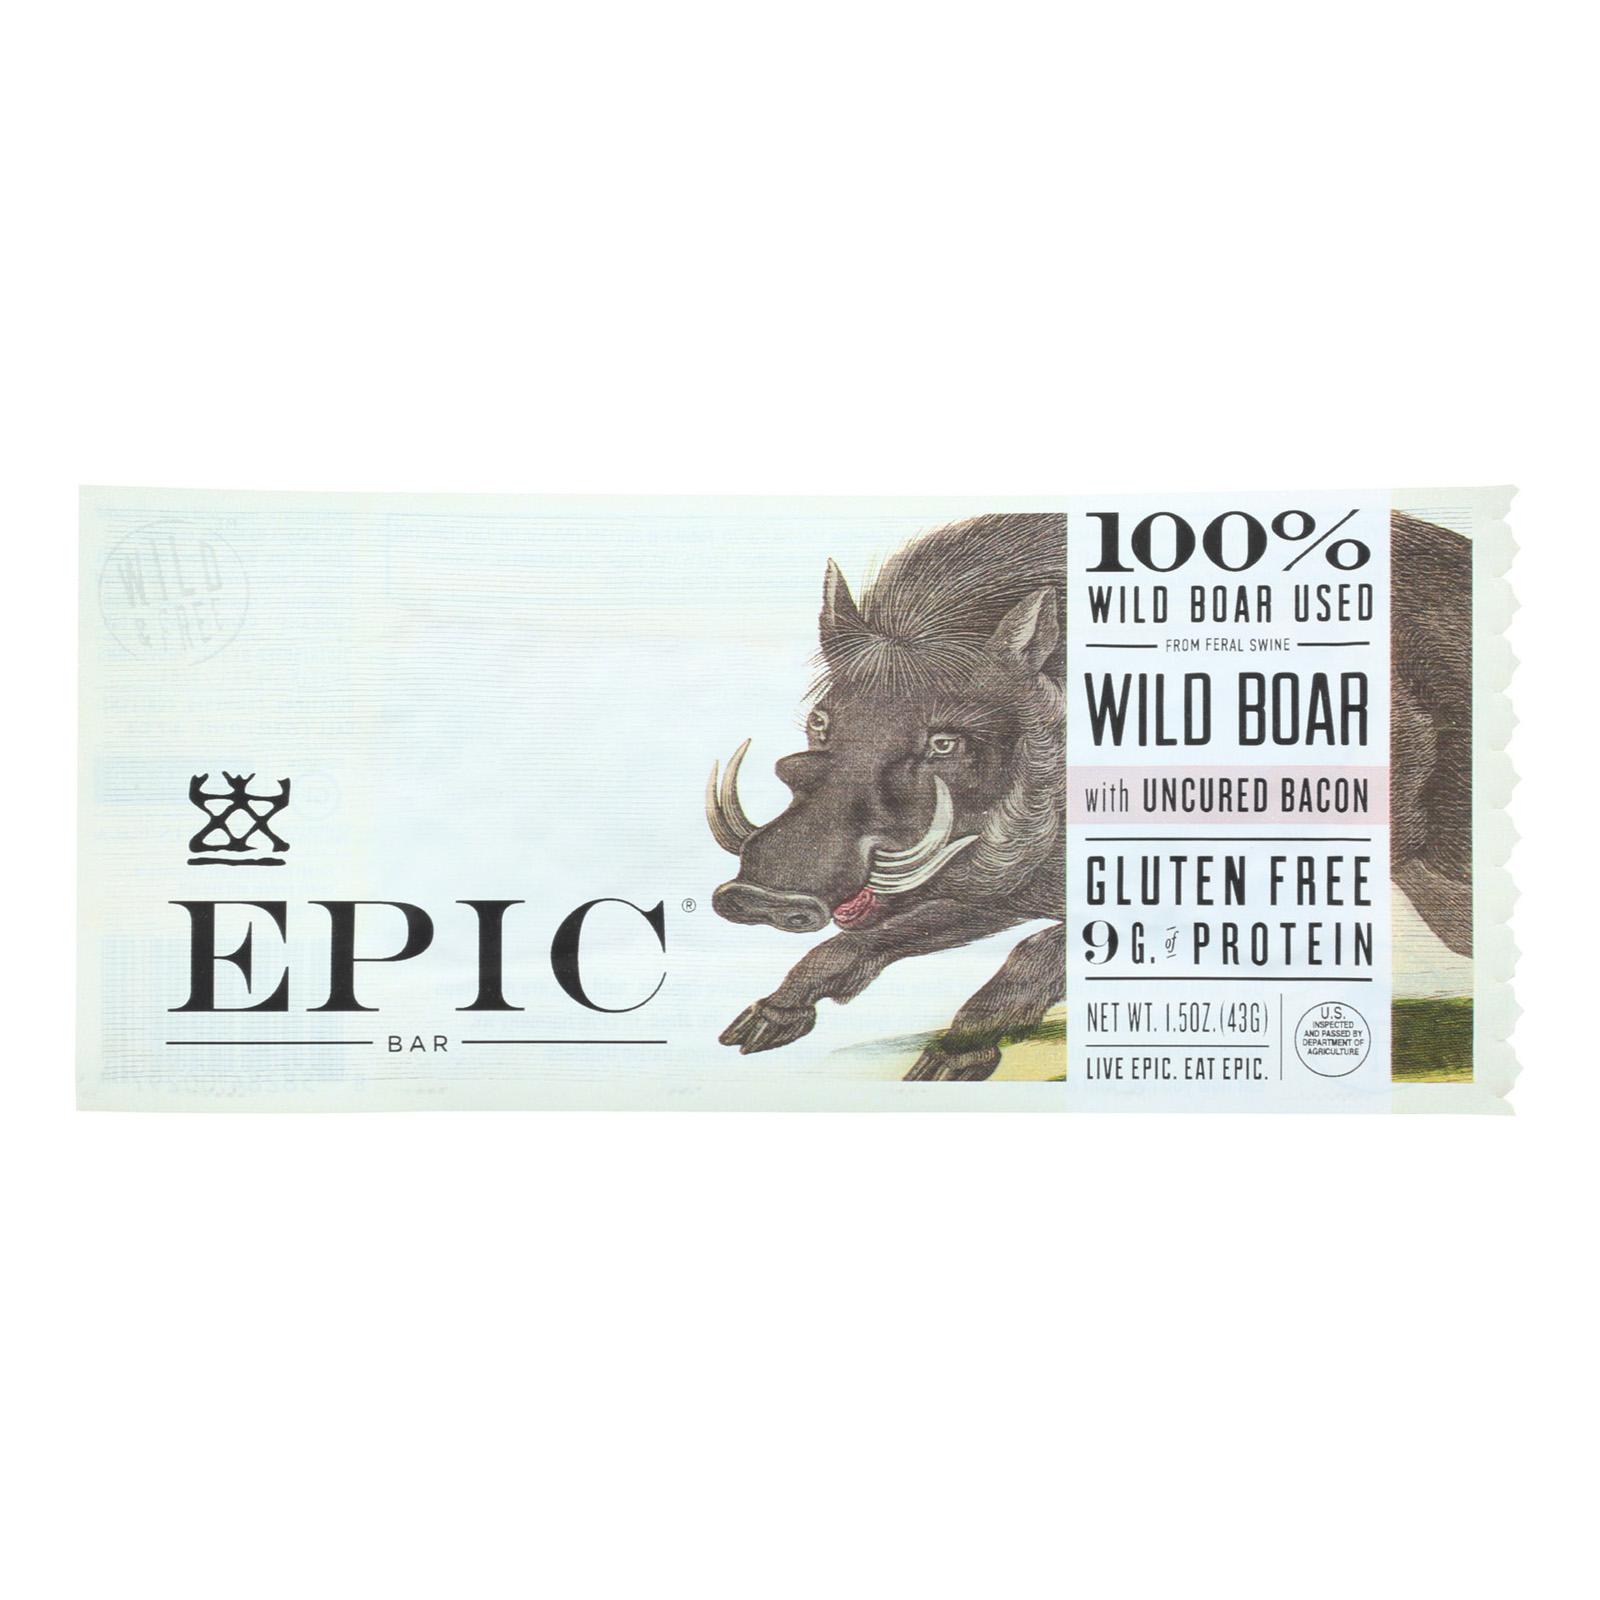 Epic Wild Boar Bar - Uncured Bacon - Case Of 12 - 1.5 Oz.